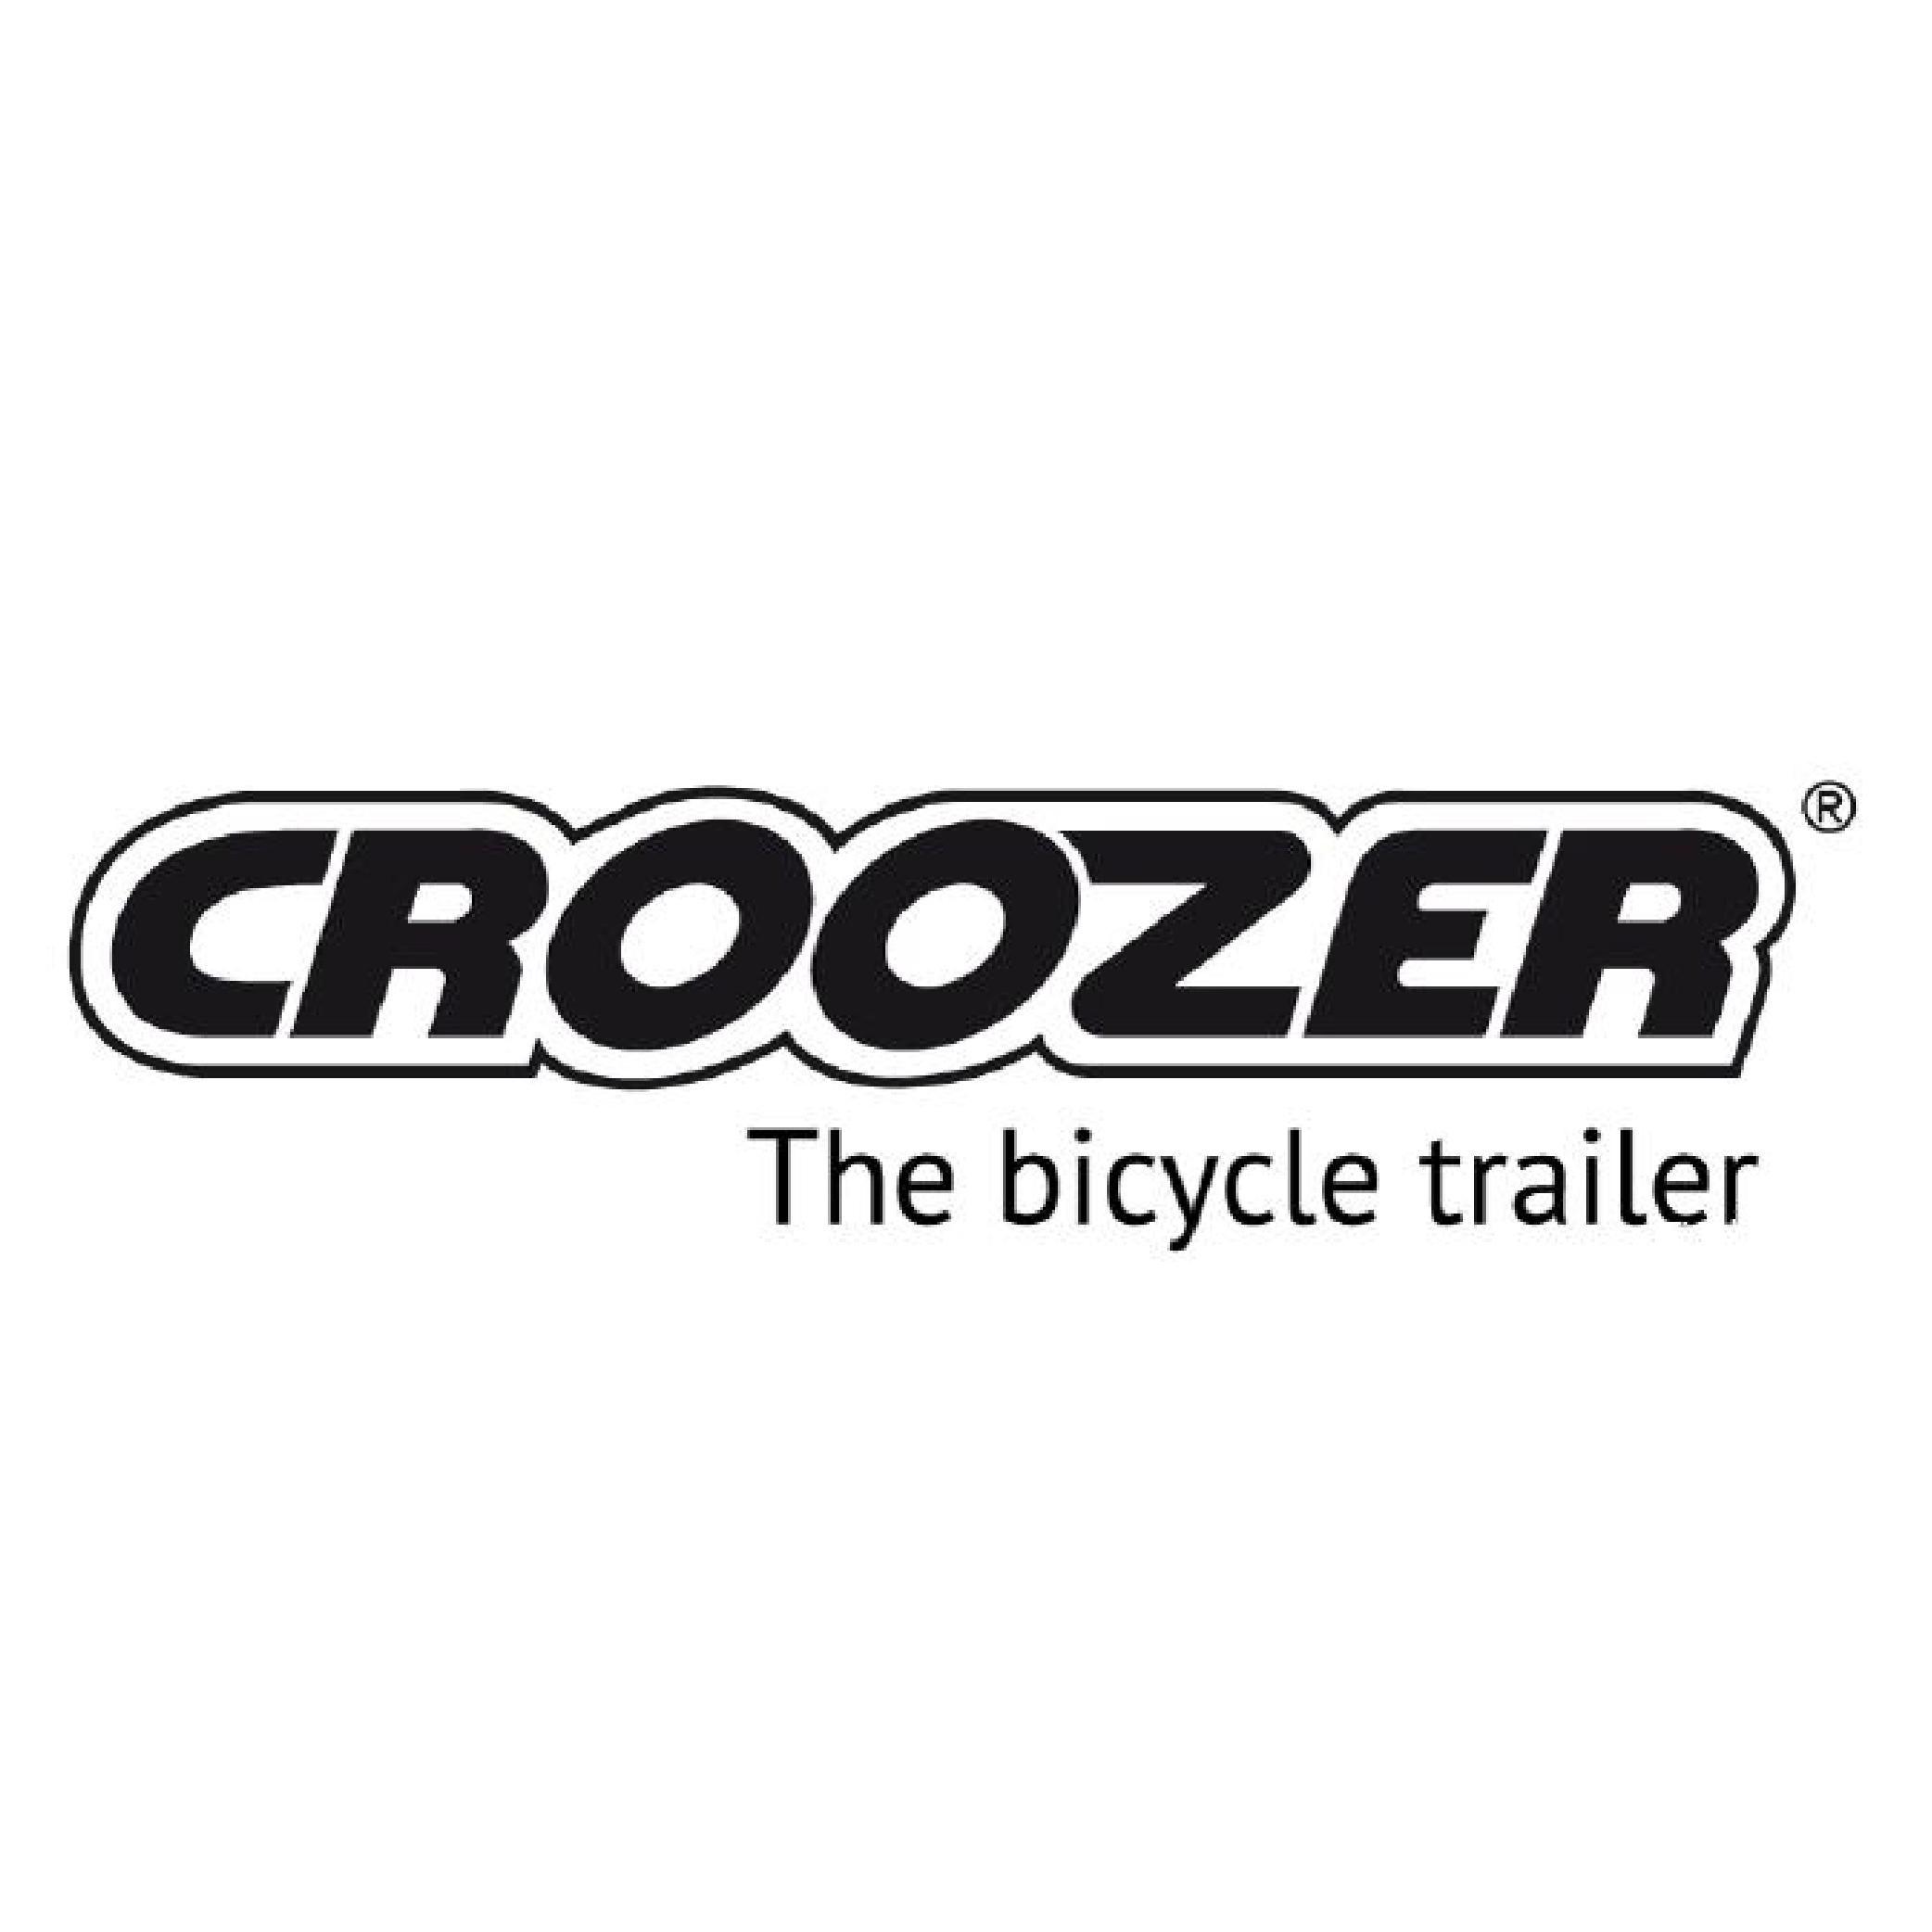 croozer-loco-fietskar-online-kopen